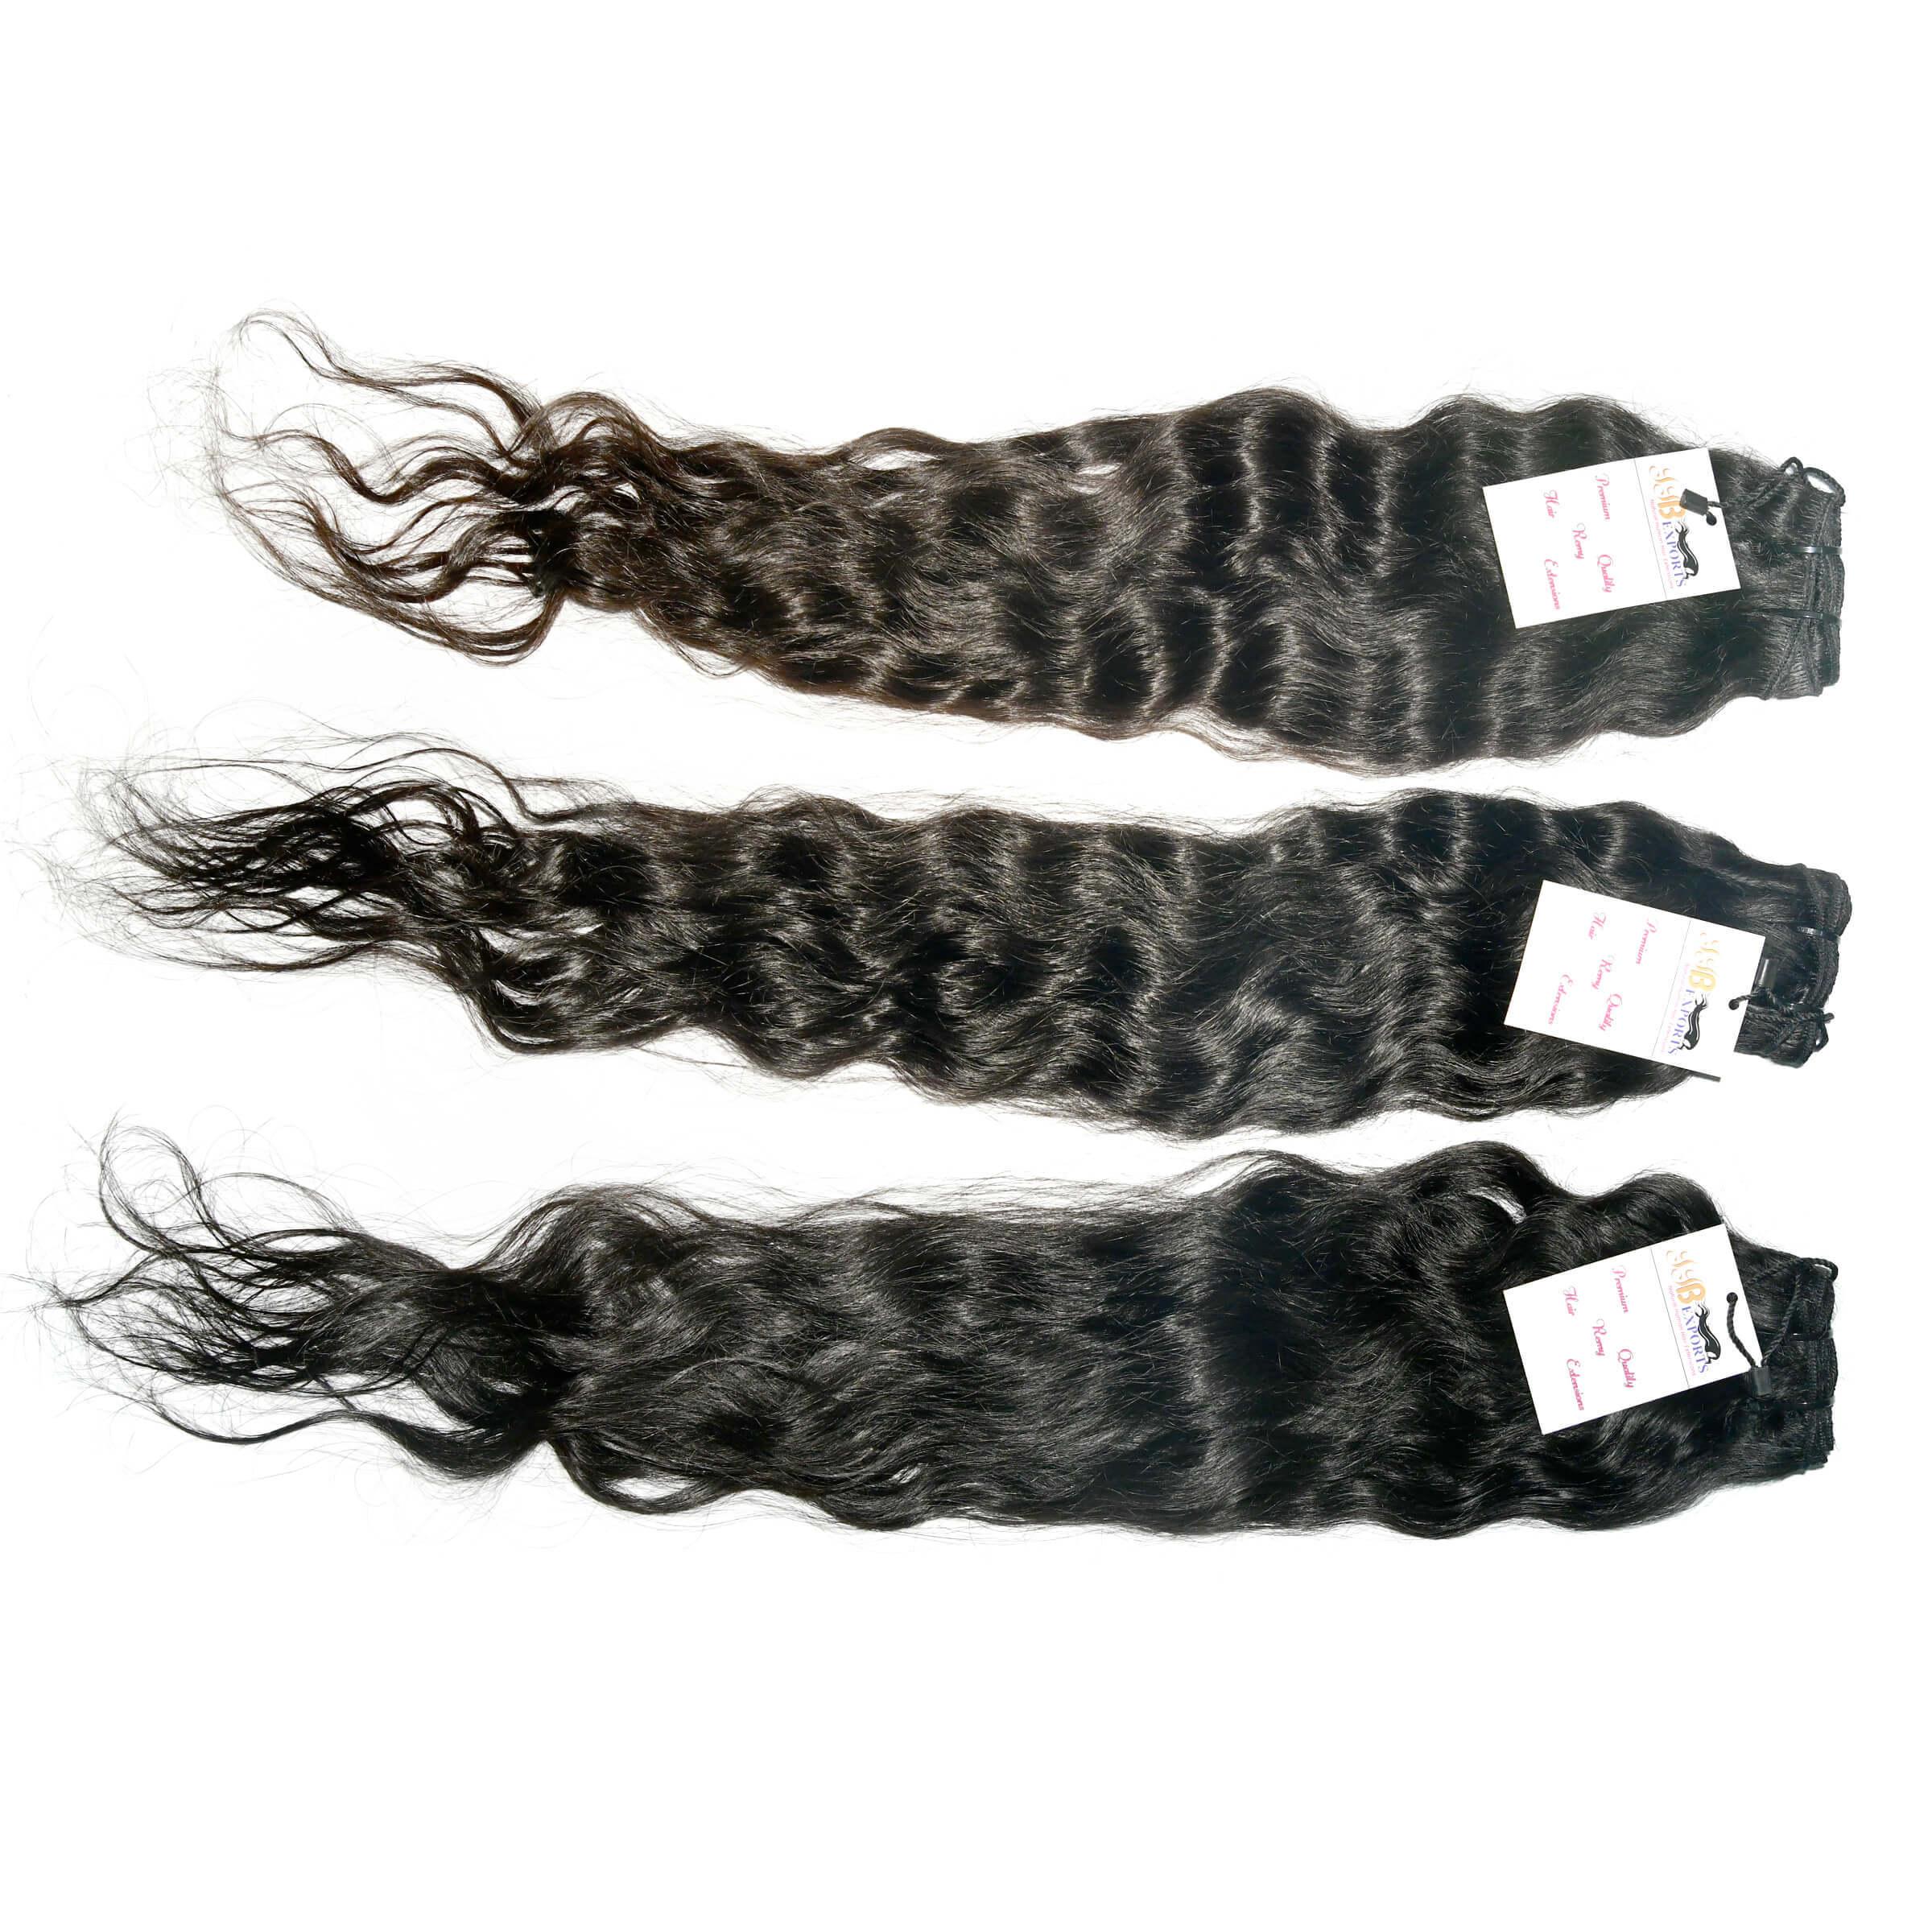 Online Shopping Human VirOnline Shopping Human Virgin Hair 10a Peruvian Loose Deep Wave Virgin Hair Curly Bundlesgin Hair 10A Peruvian Loose Deep Wave Virgin Hair curly Bundles